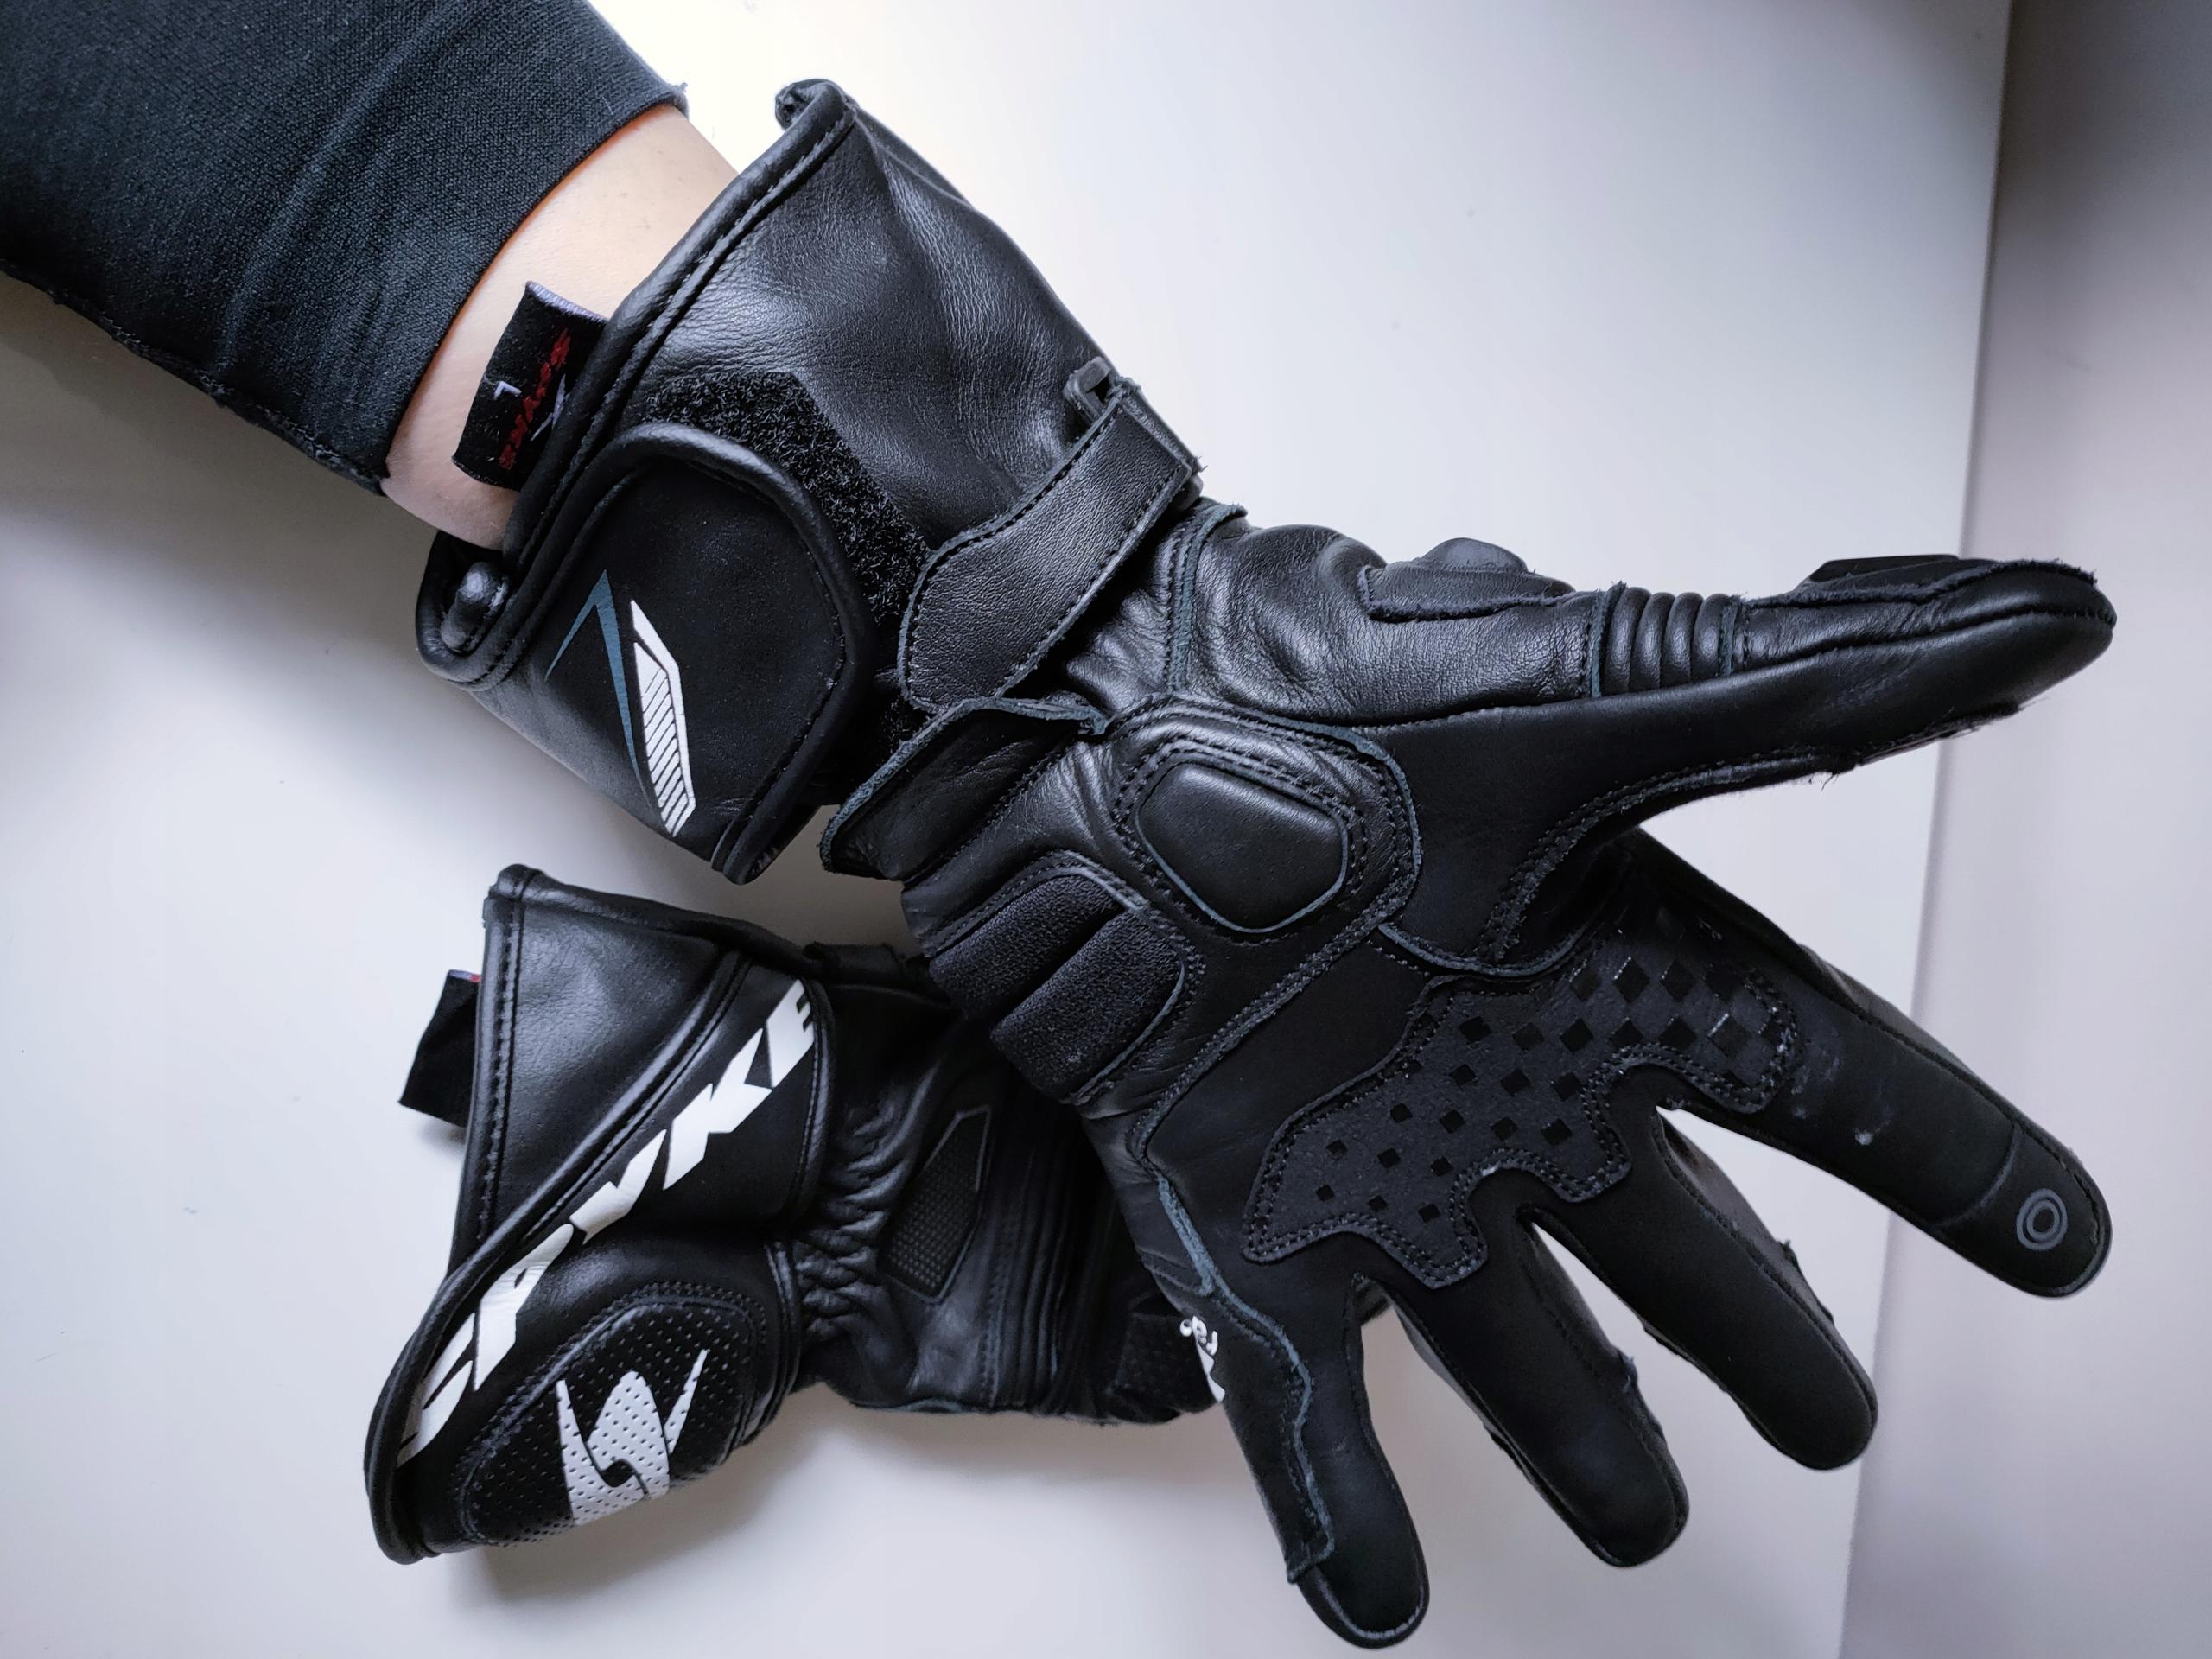 Перчатки мотоцикл spyke tech race - отправка gratis, фото 8